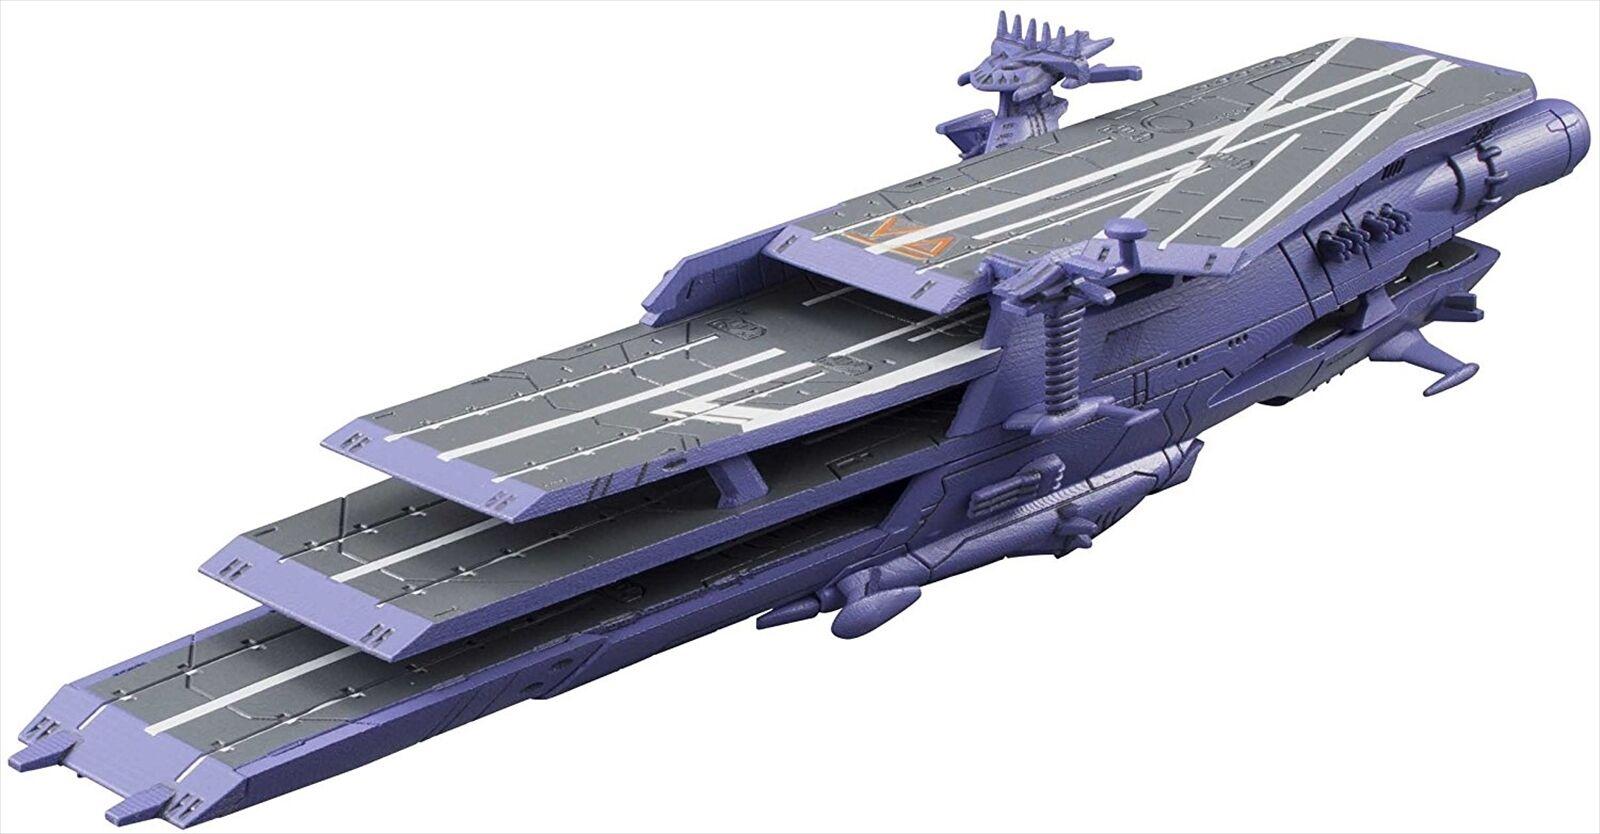 Megahouse Cosmo Fleet Special Space Battleship Yamato 2199 Gaiperon Ranbea